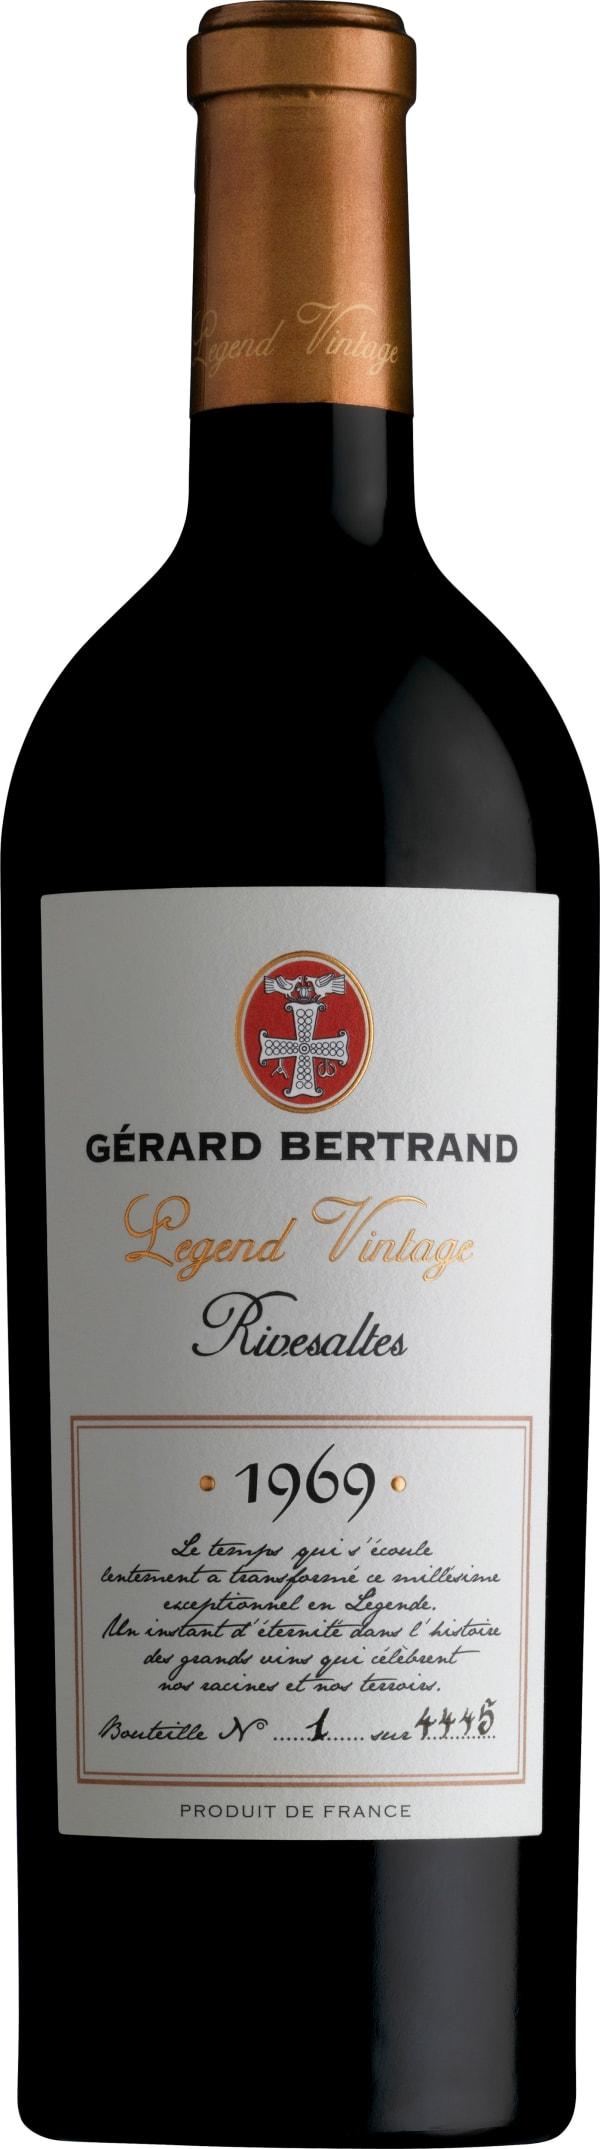 Gérard Bertrand Legend Vintage Rivesaltes 1969